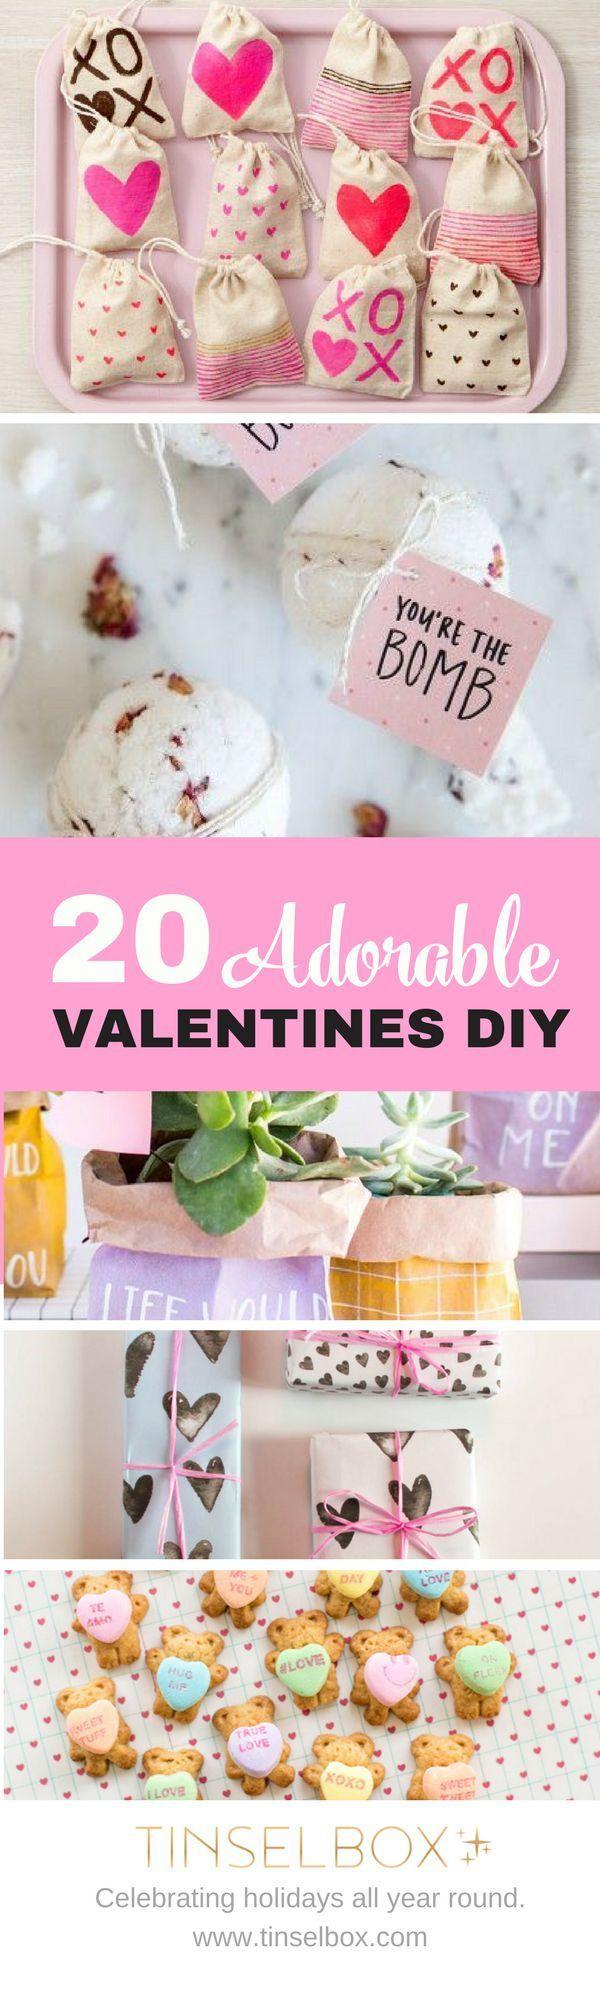 20 Adorable Valentines DIY – Best of Pinterest #valentines